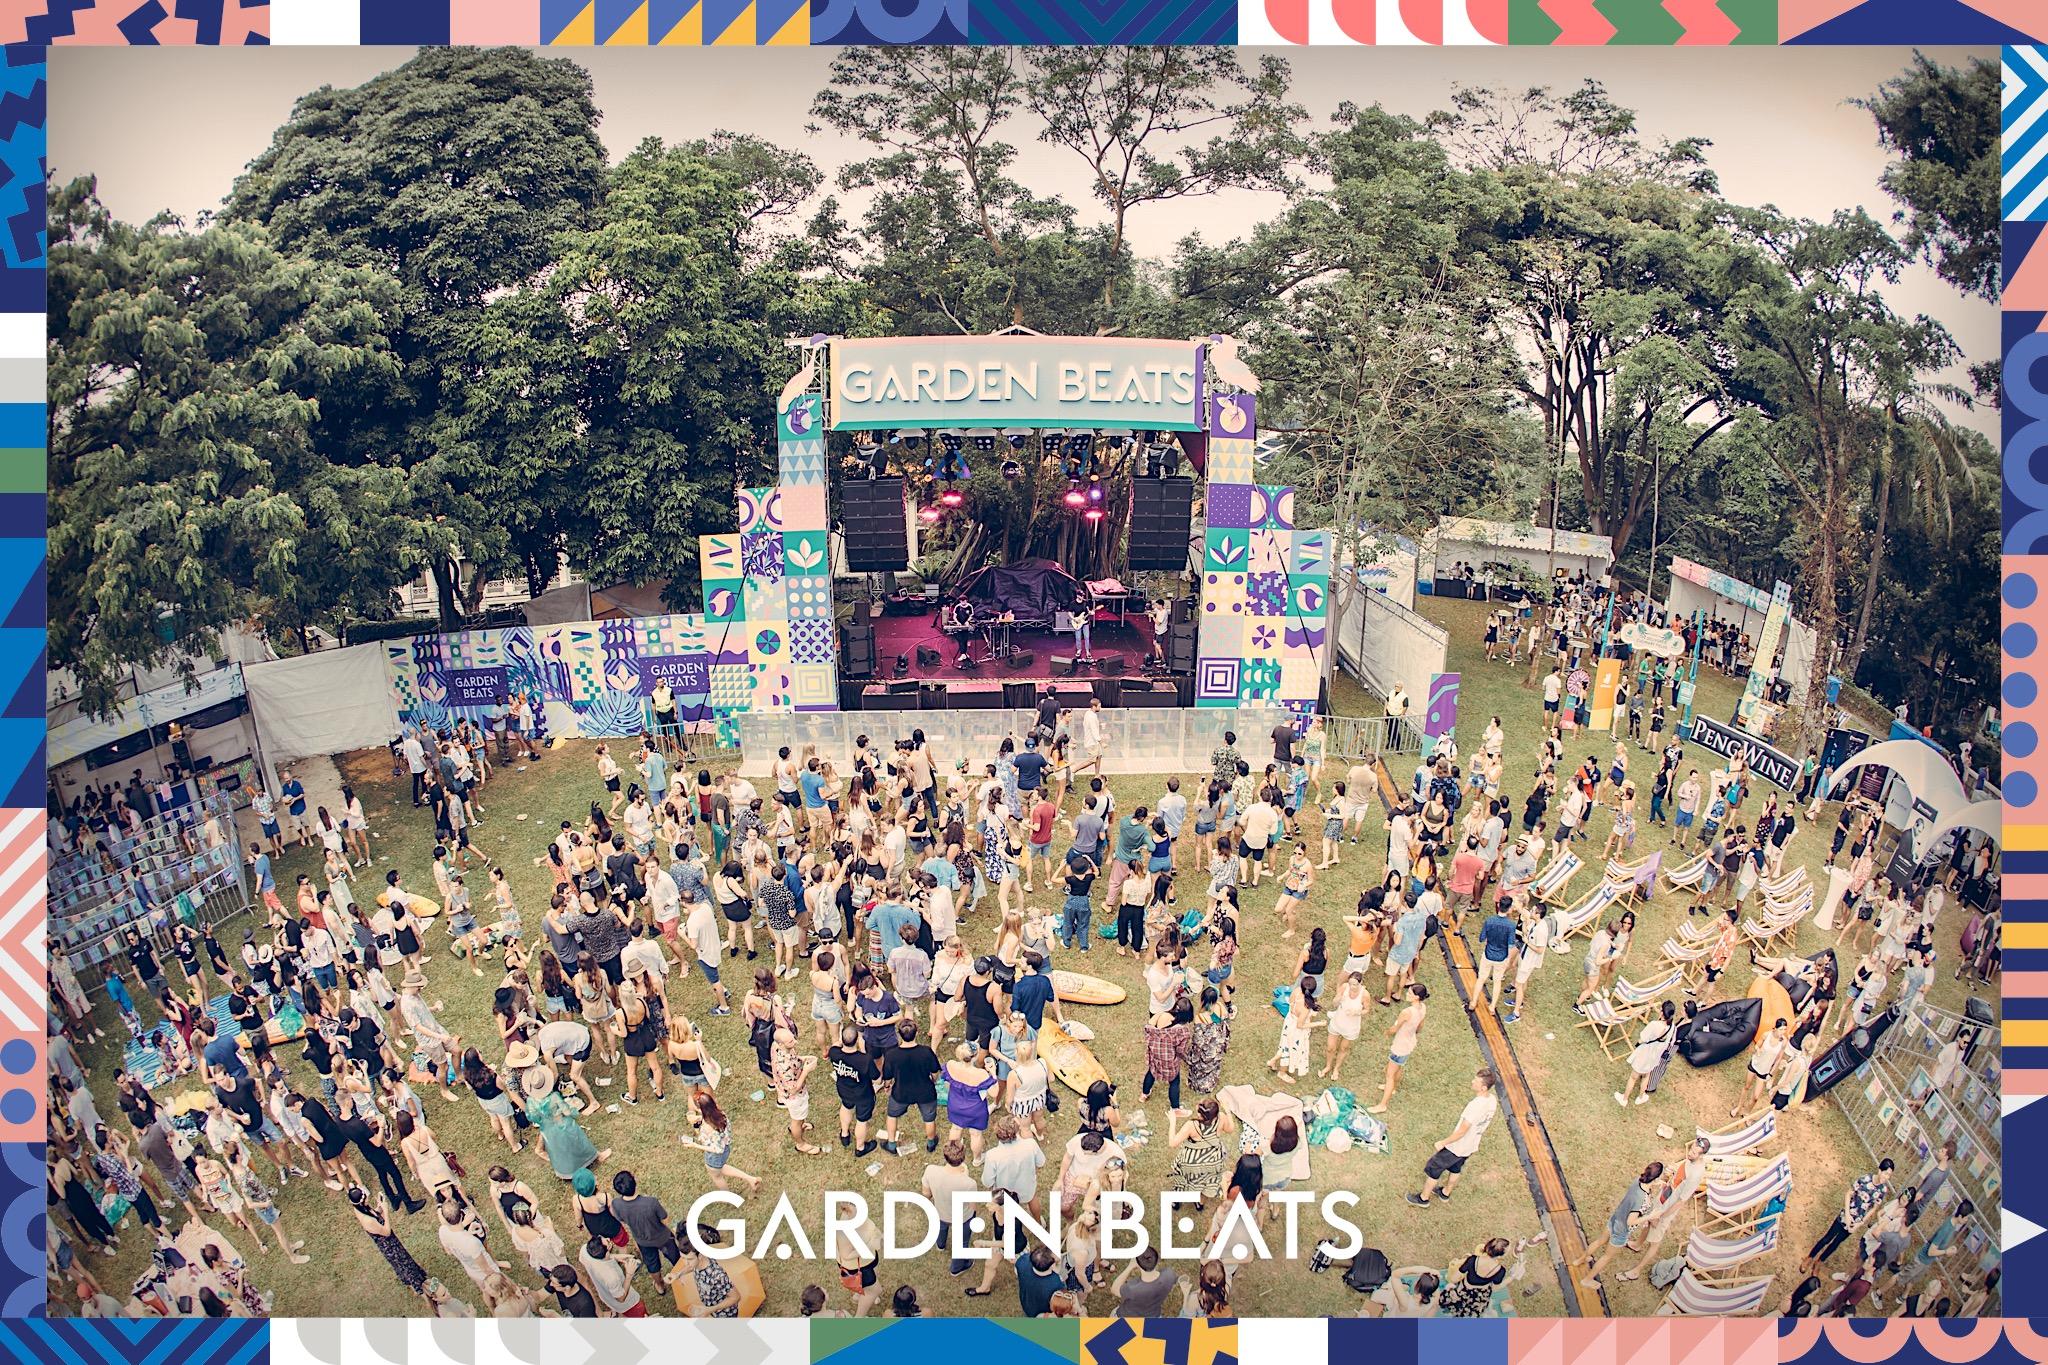 03032018_GardenBeats_Colossal566_Watermarked.jpg